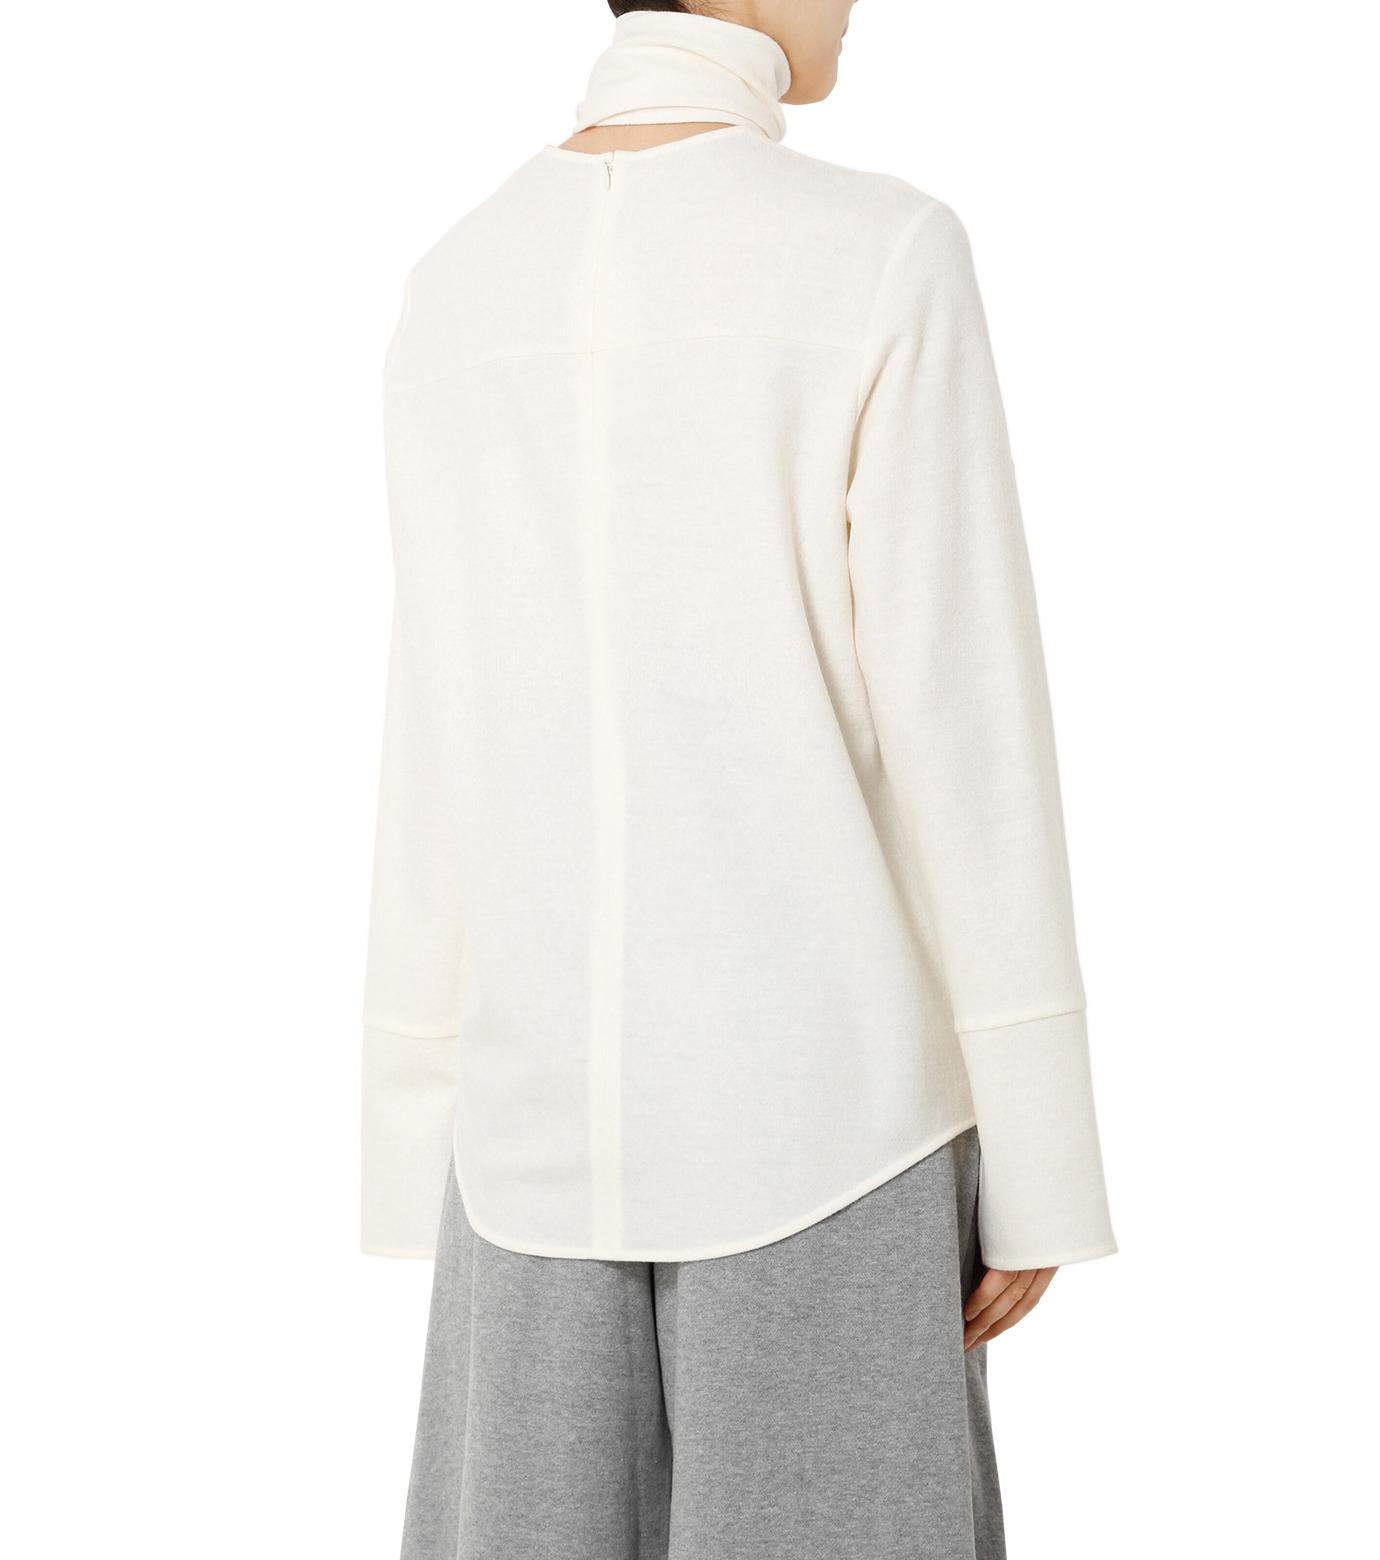 LE CIEL BLEU(ルシェルブルー)のショートボウブラウス-WHITE(シャツ/shirt)-18A63622 拡大詳細画像2